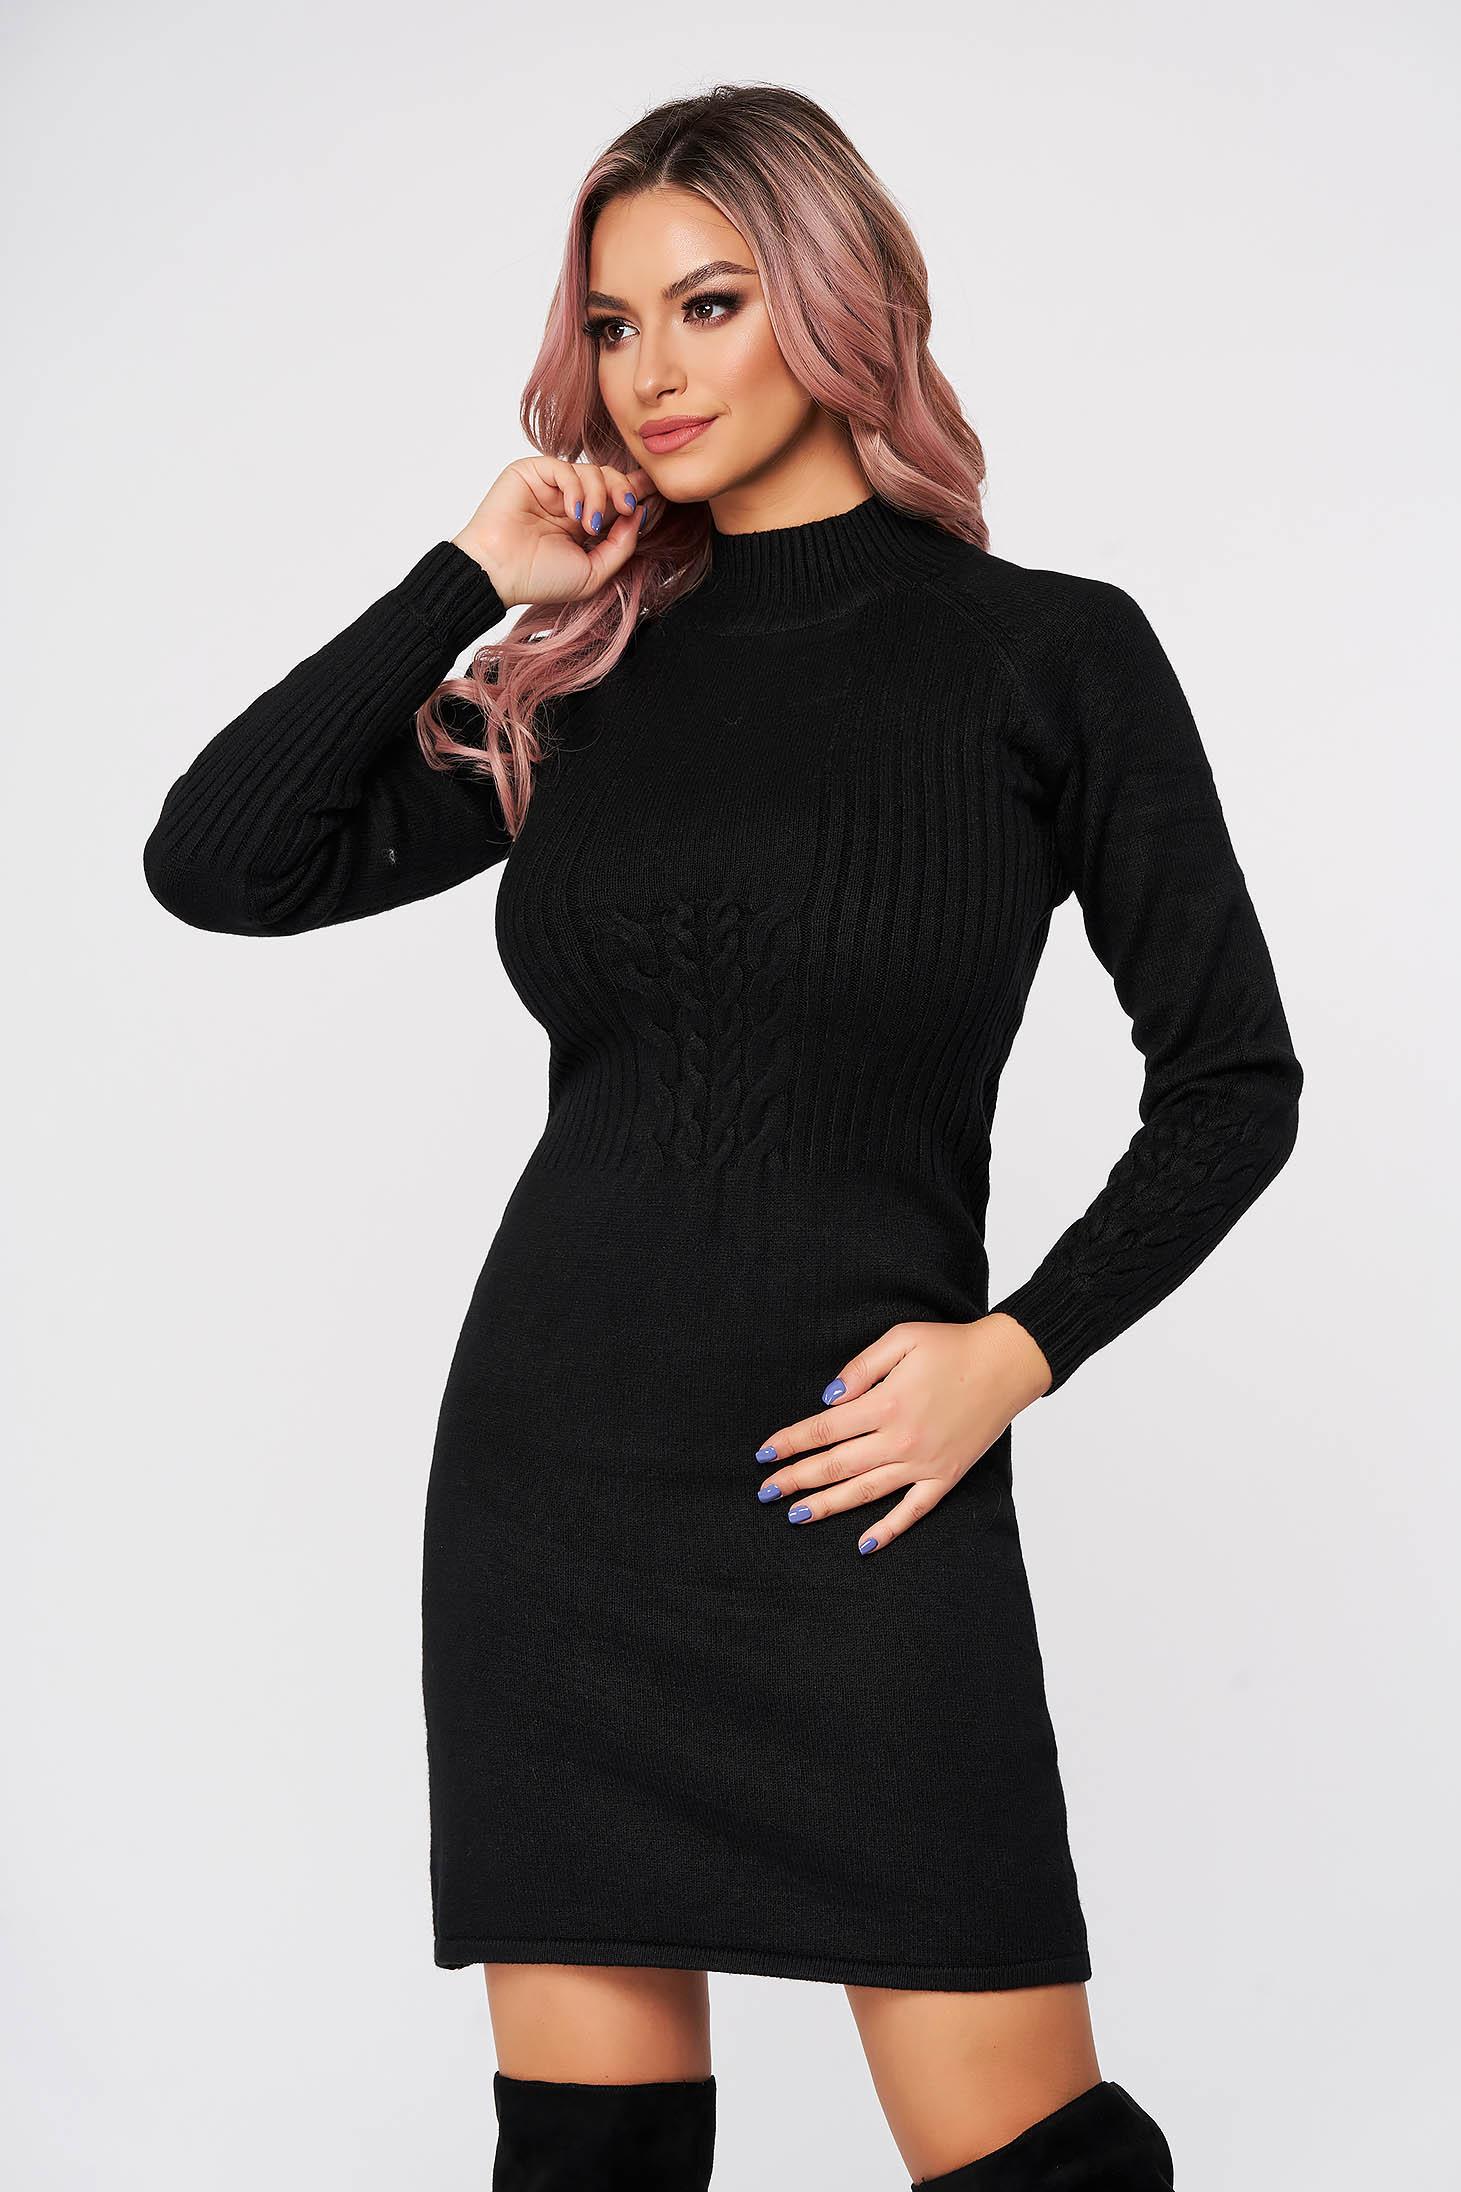 Rochie SunShine neagra scurta de zi in clos din material tricotat pe gat